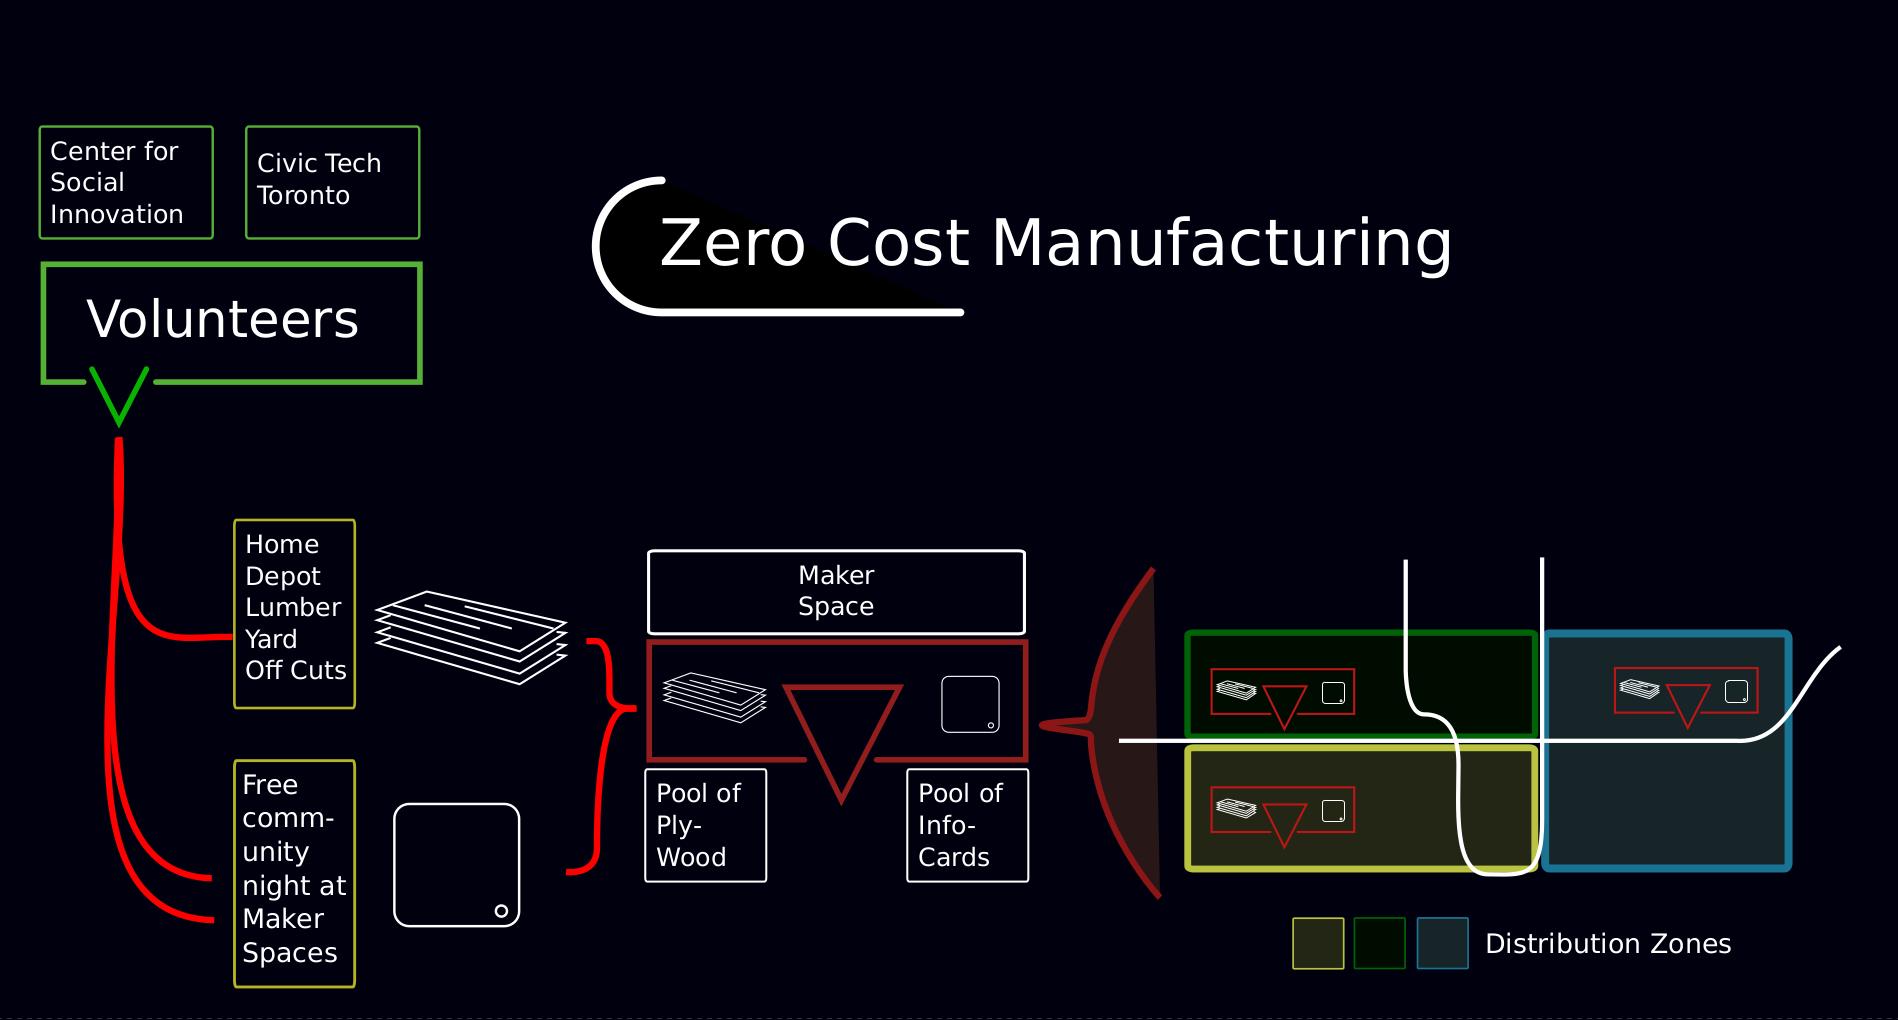 Zero Cost Manufacturing